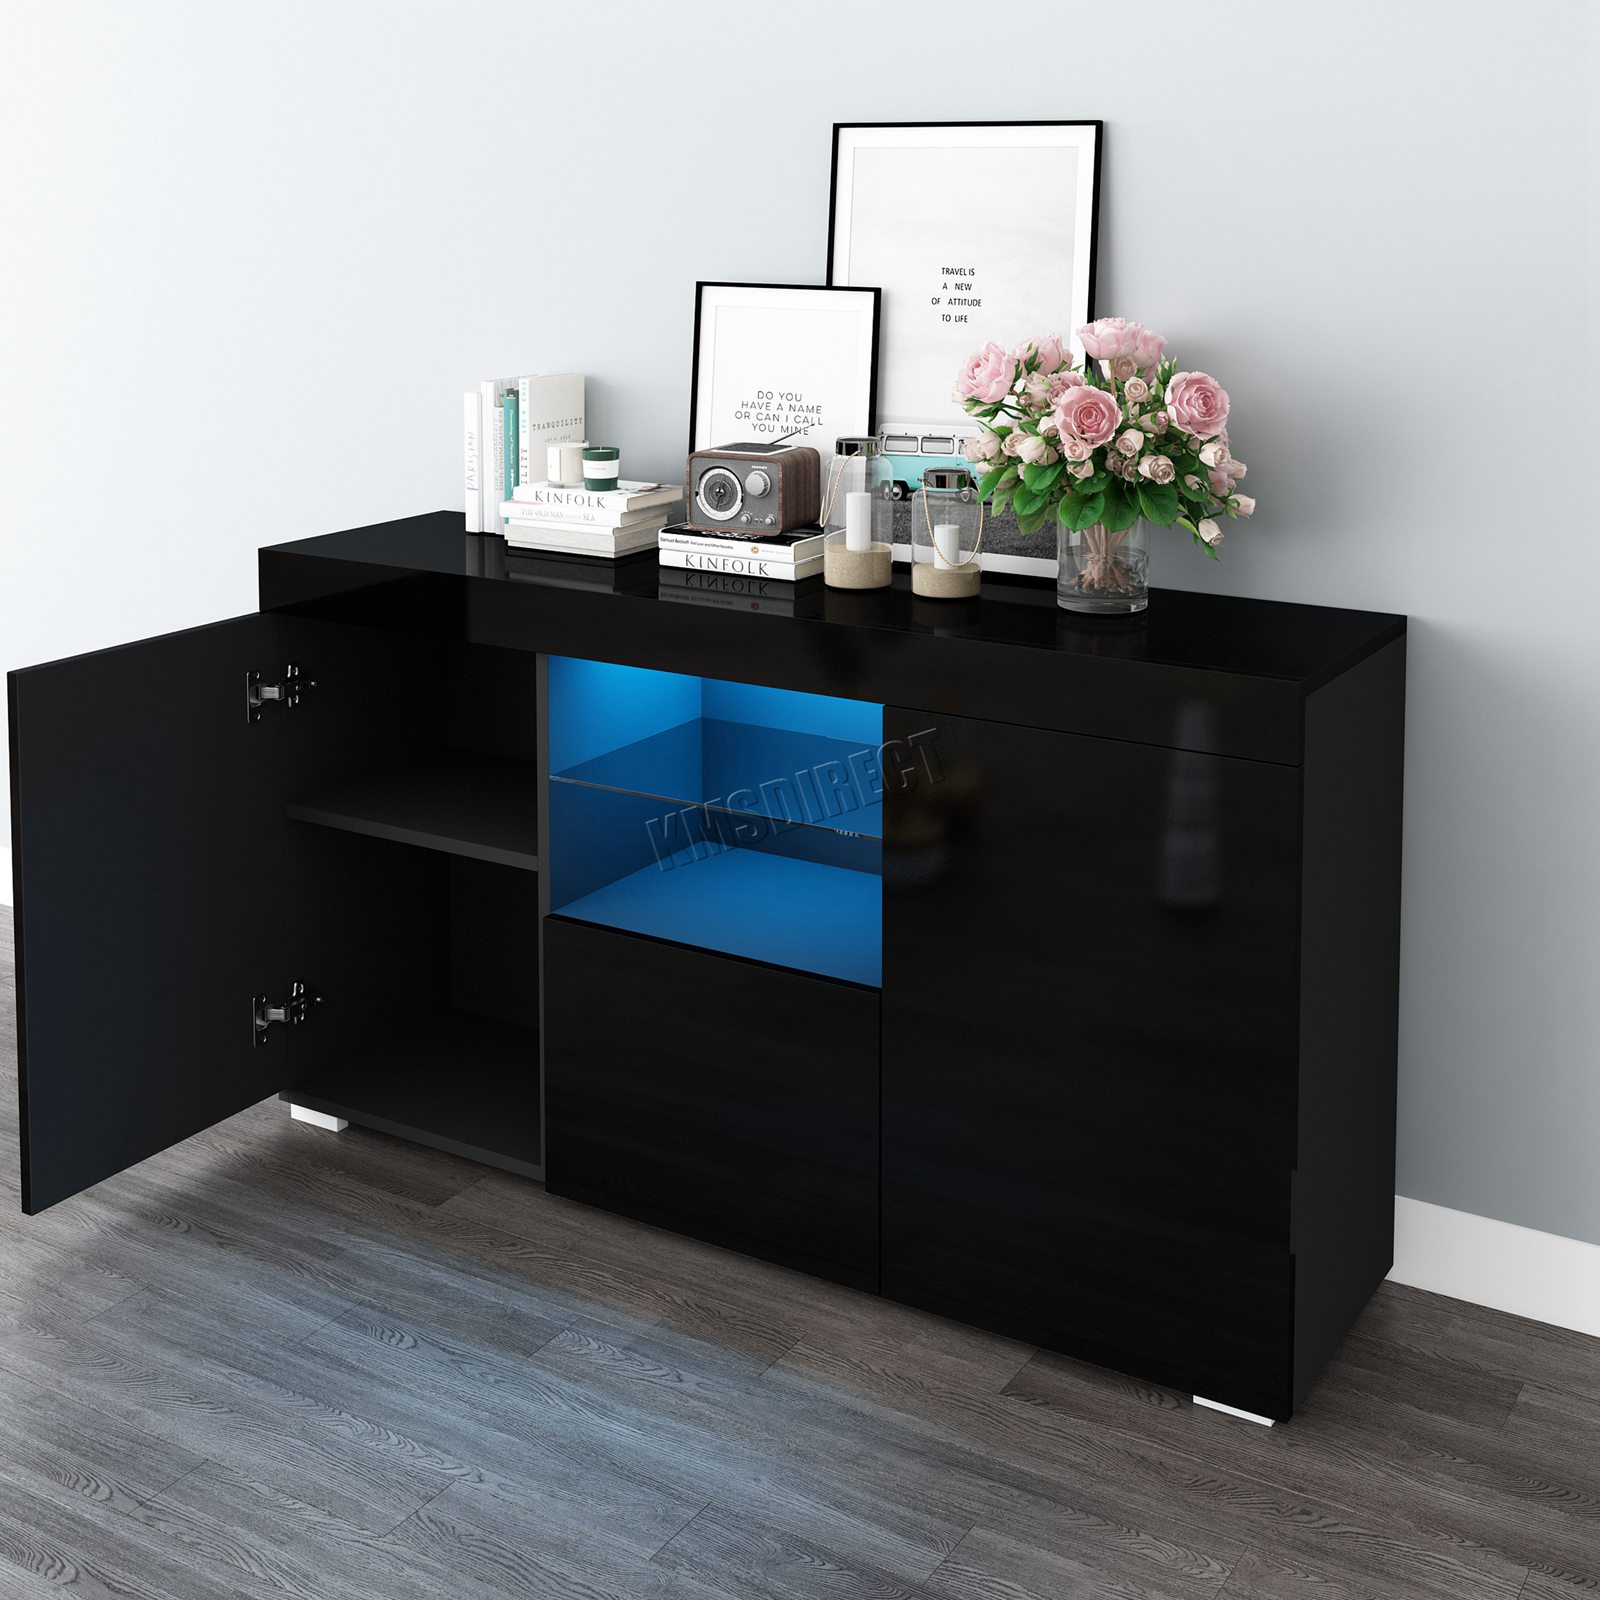 WestWood-PB-High-Gloss-Cabinet-LED-Bookshelf-Sideboard-Cupboard-Home-Unit-PHC03 thumbnail 13